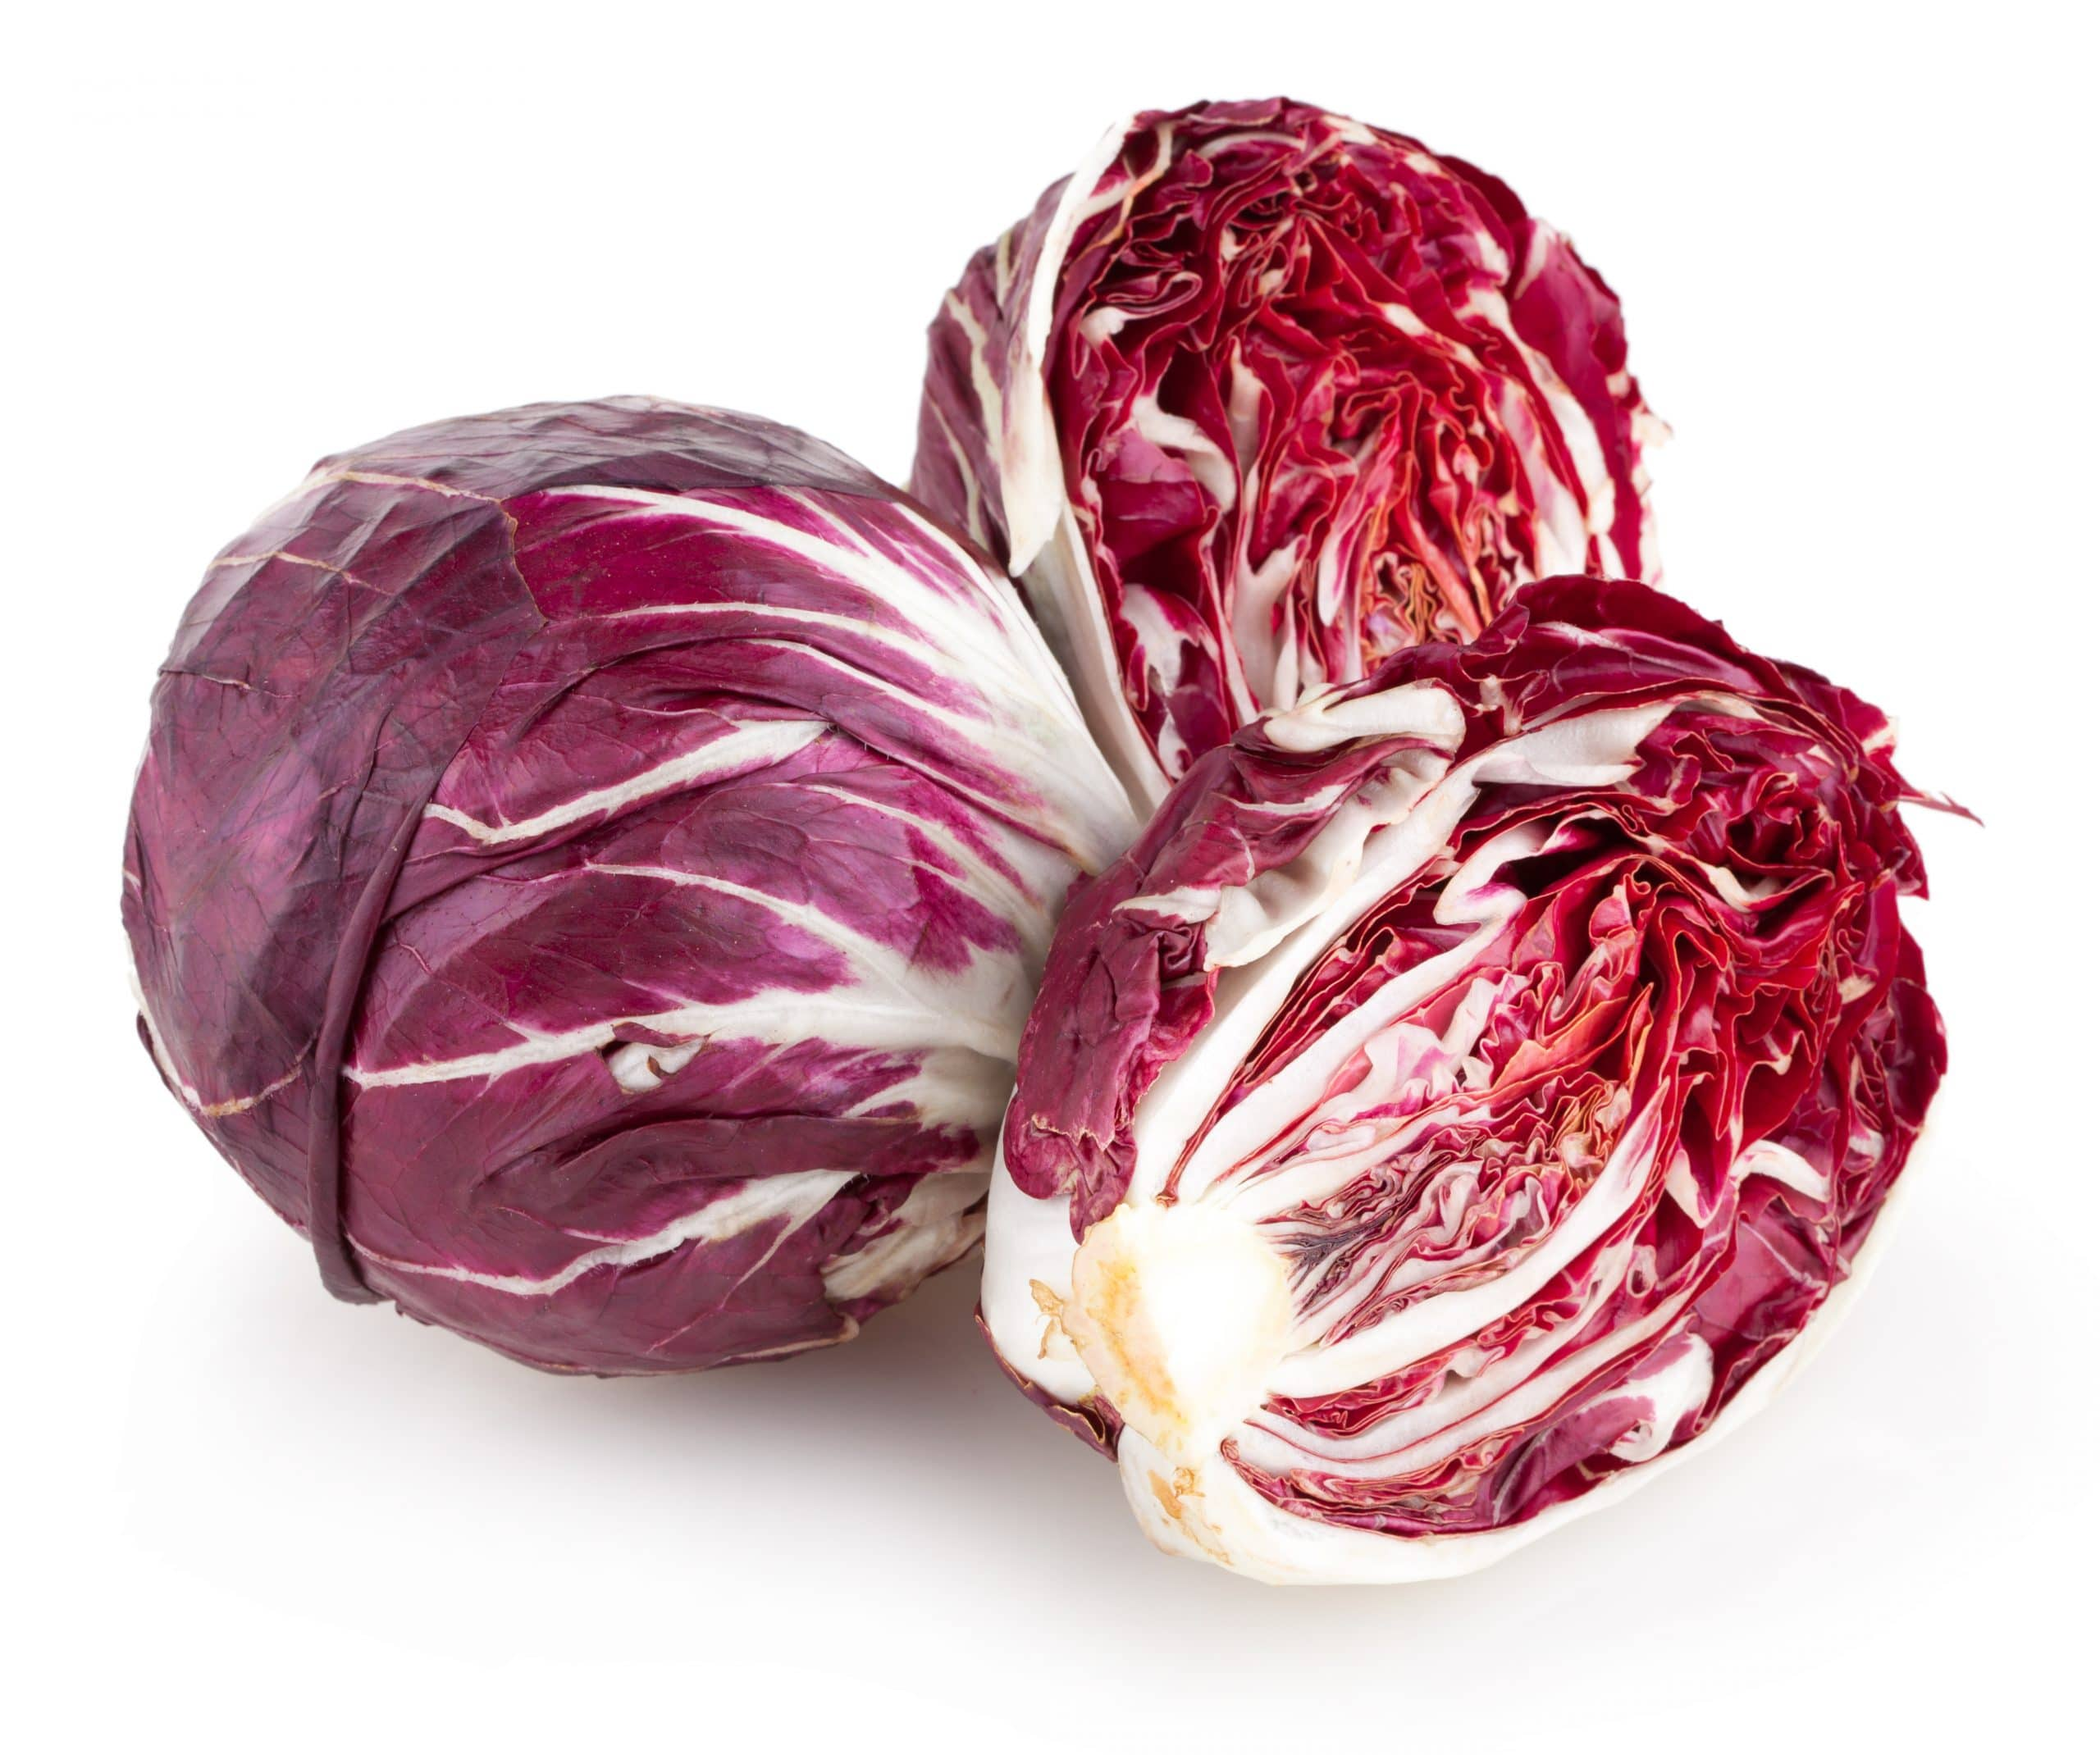 red cabbage radiccio isolated on white